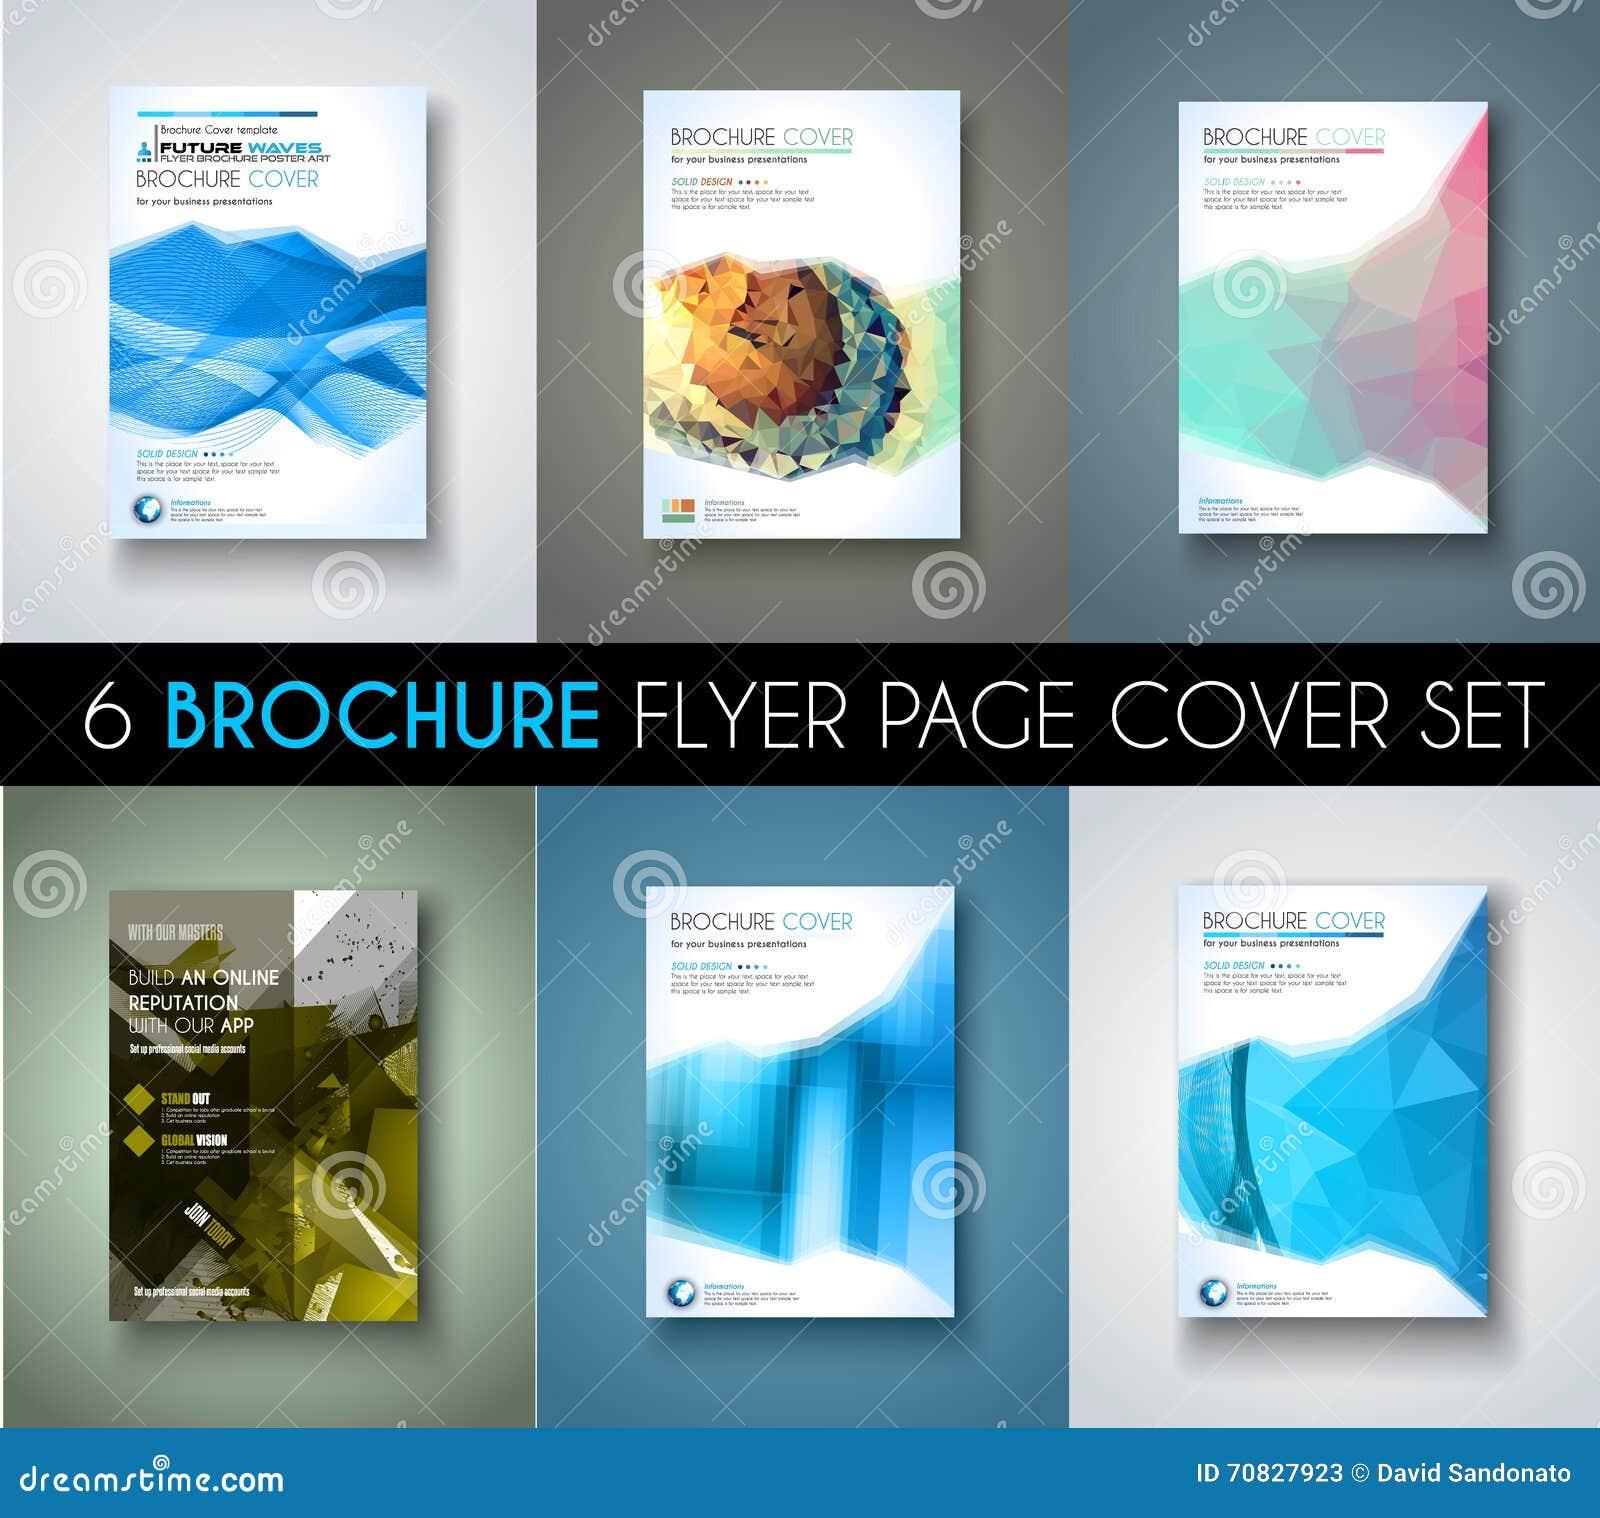 Set of 6 brochures templates flyer designs or depliant covers for download set of 6 brochures templates flyer designs or depliant covers for business stock vector wajeb Choice Image